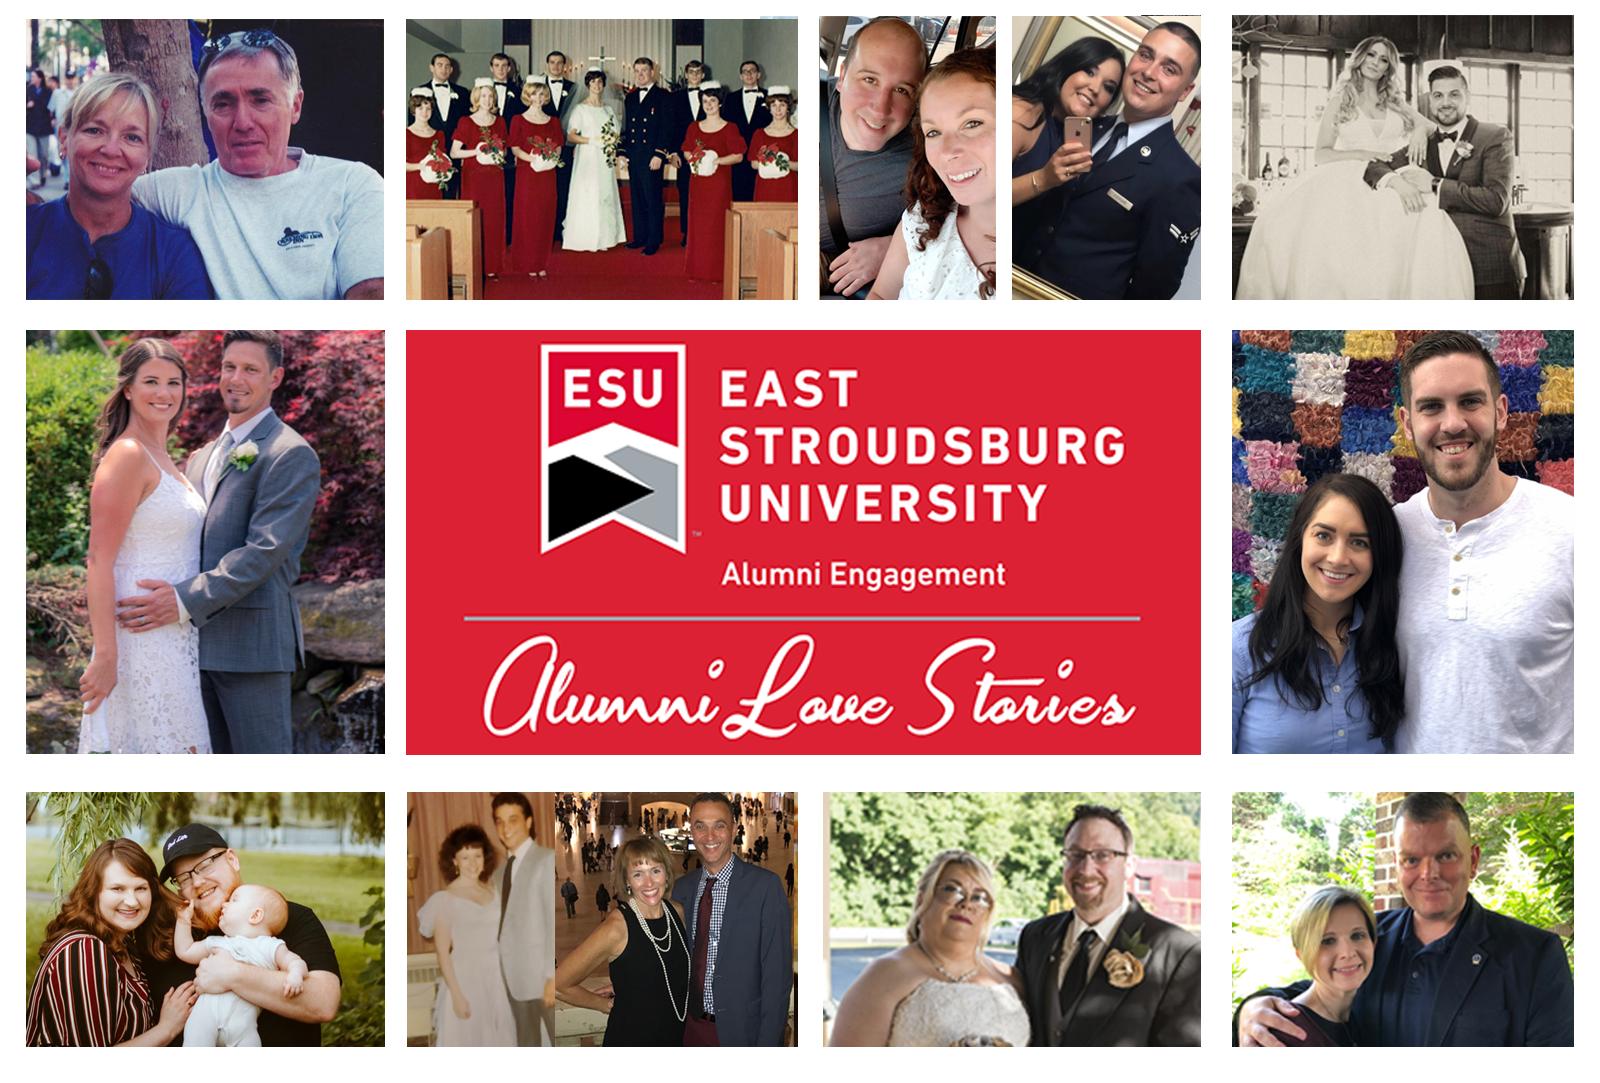 Alumni Love Stories